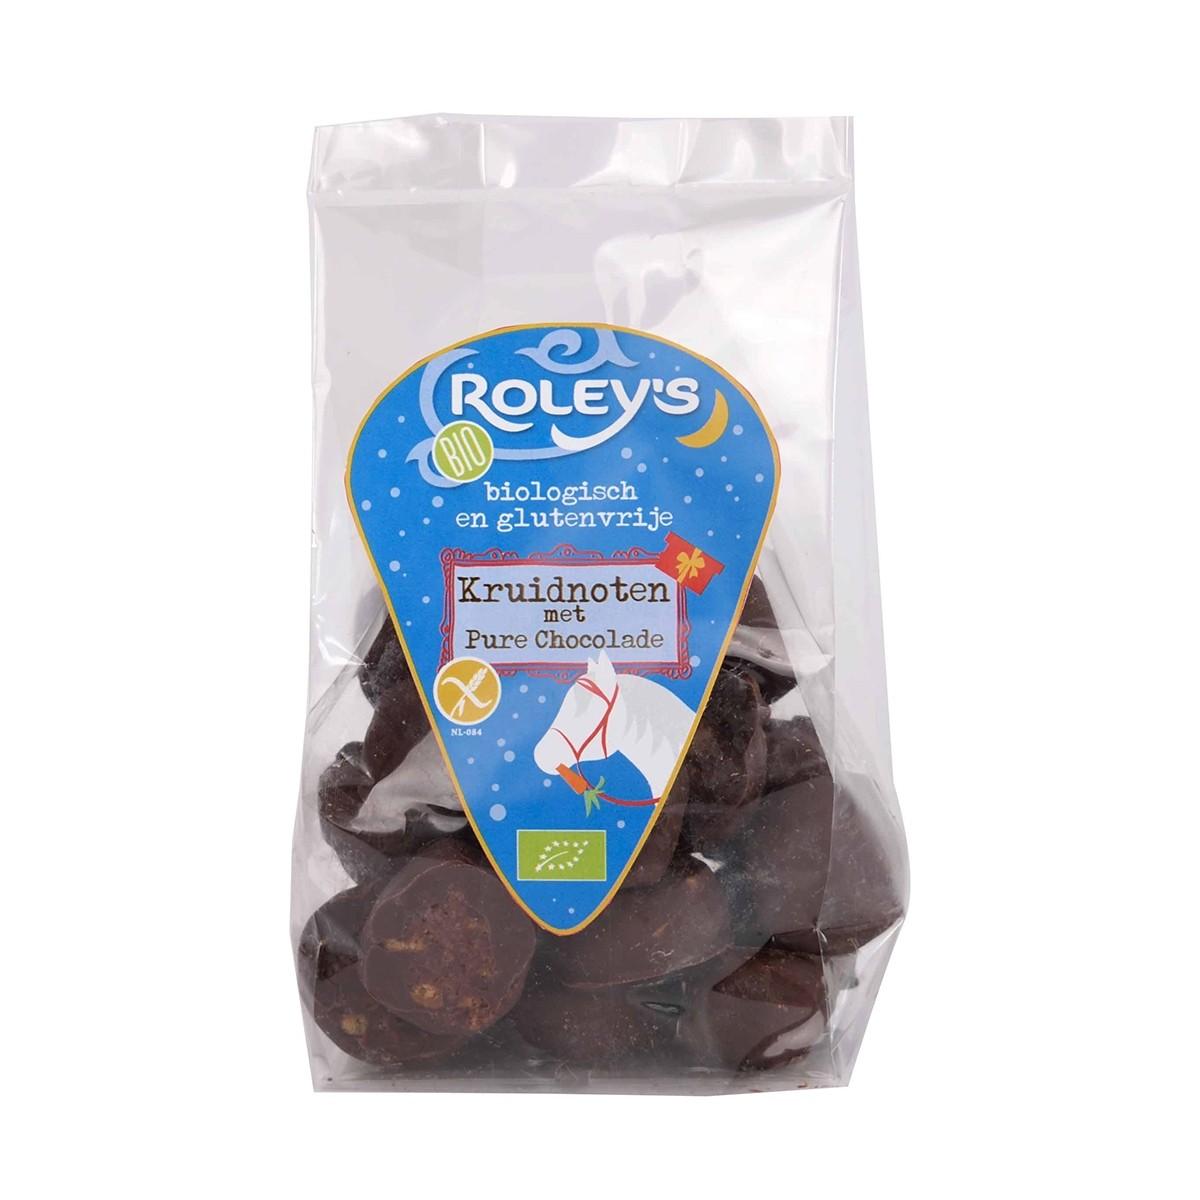 Kruidnoten Met Pure Chocolade